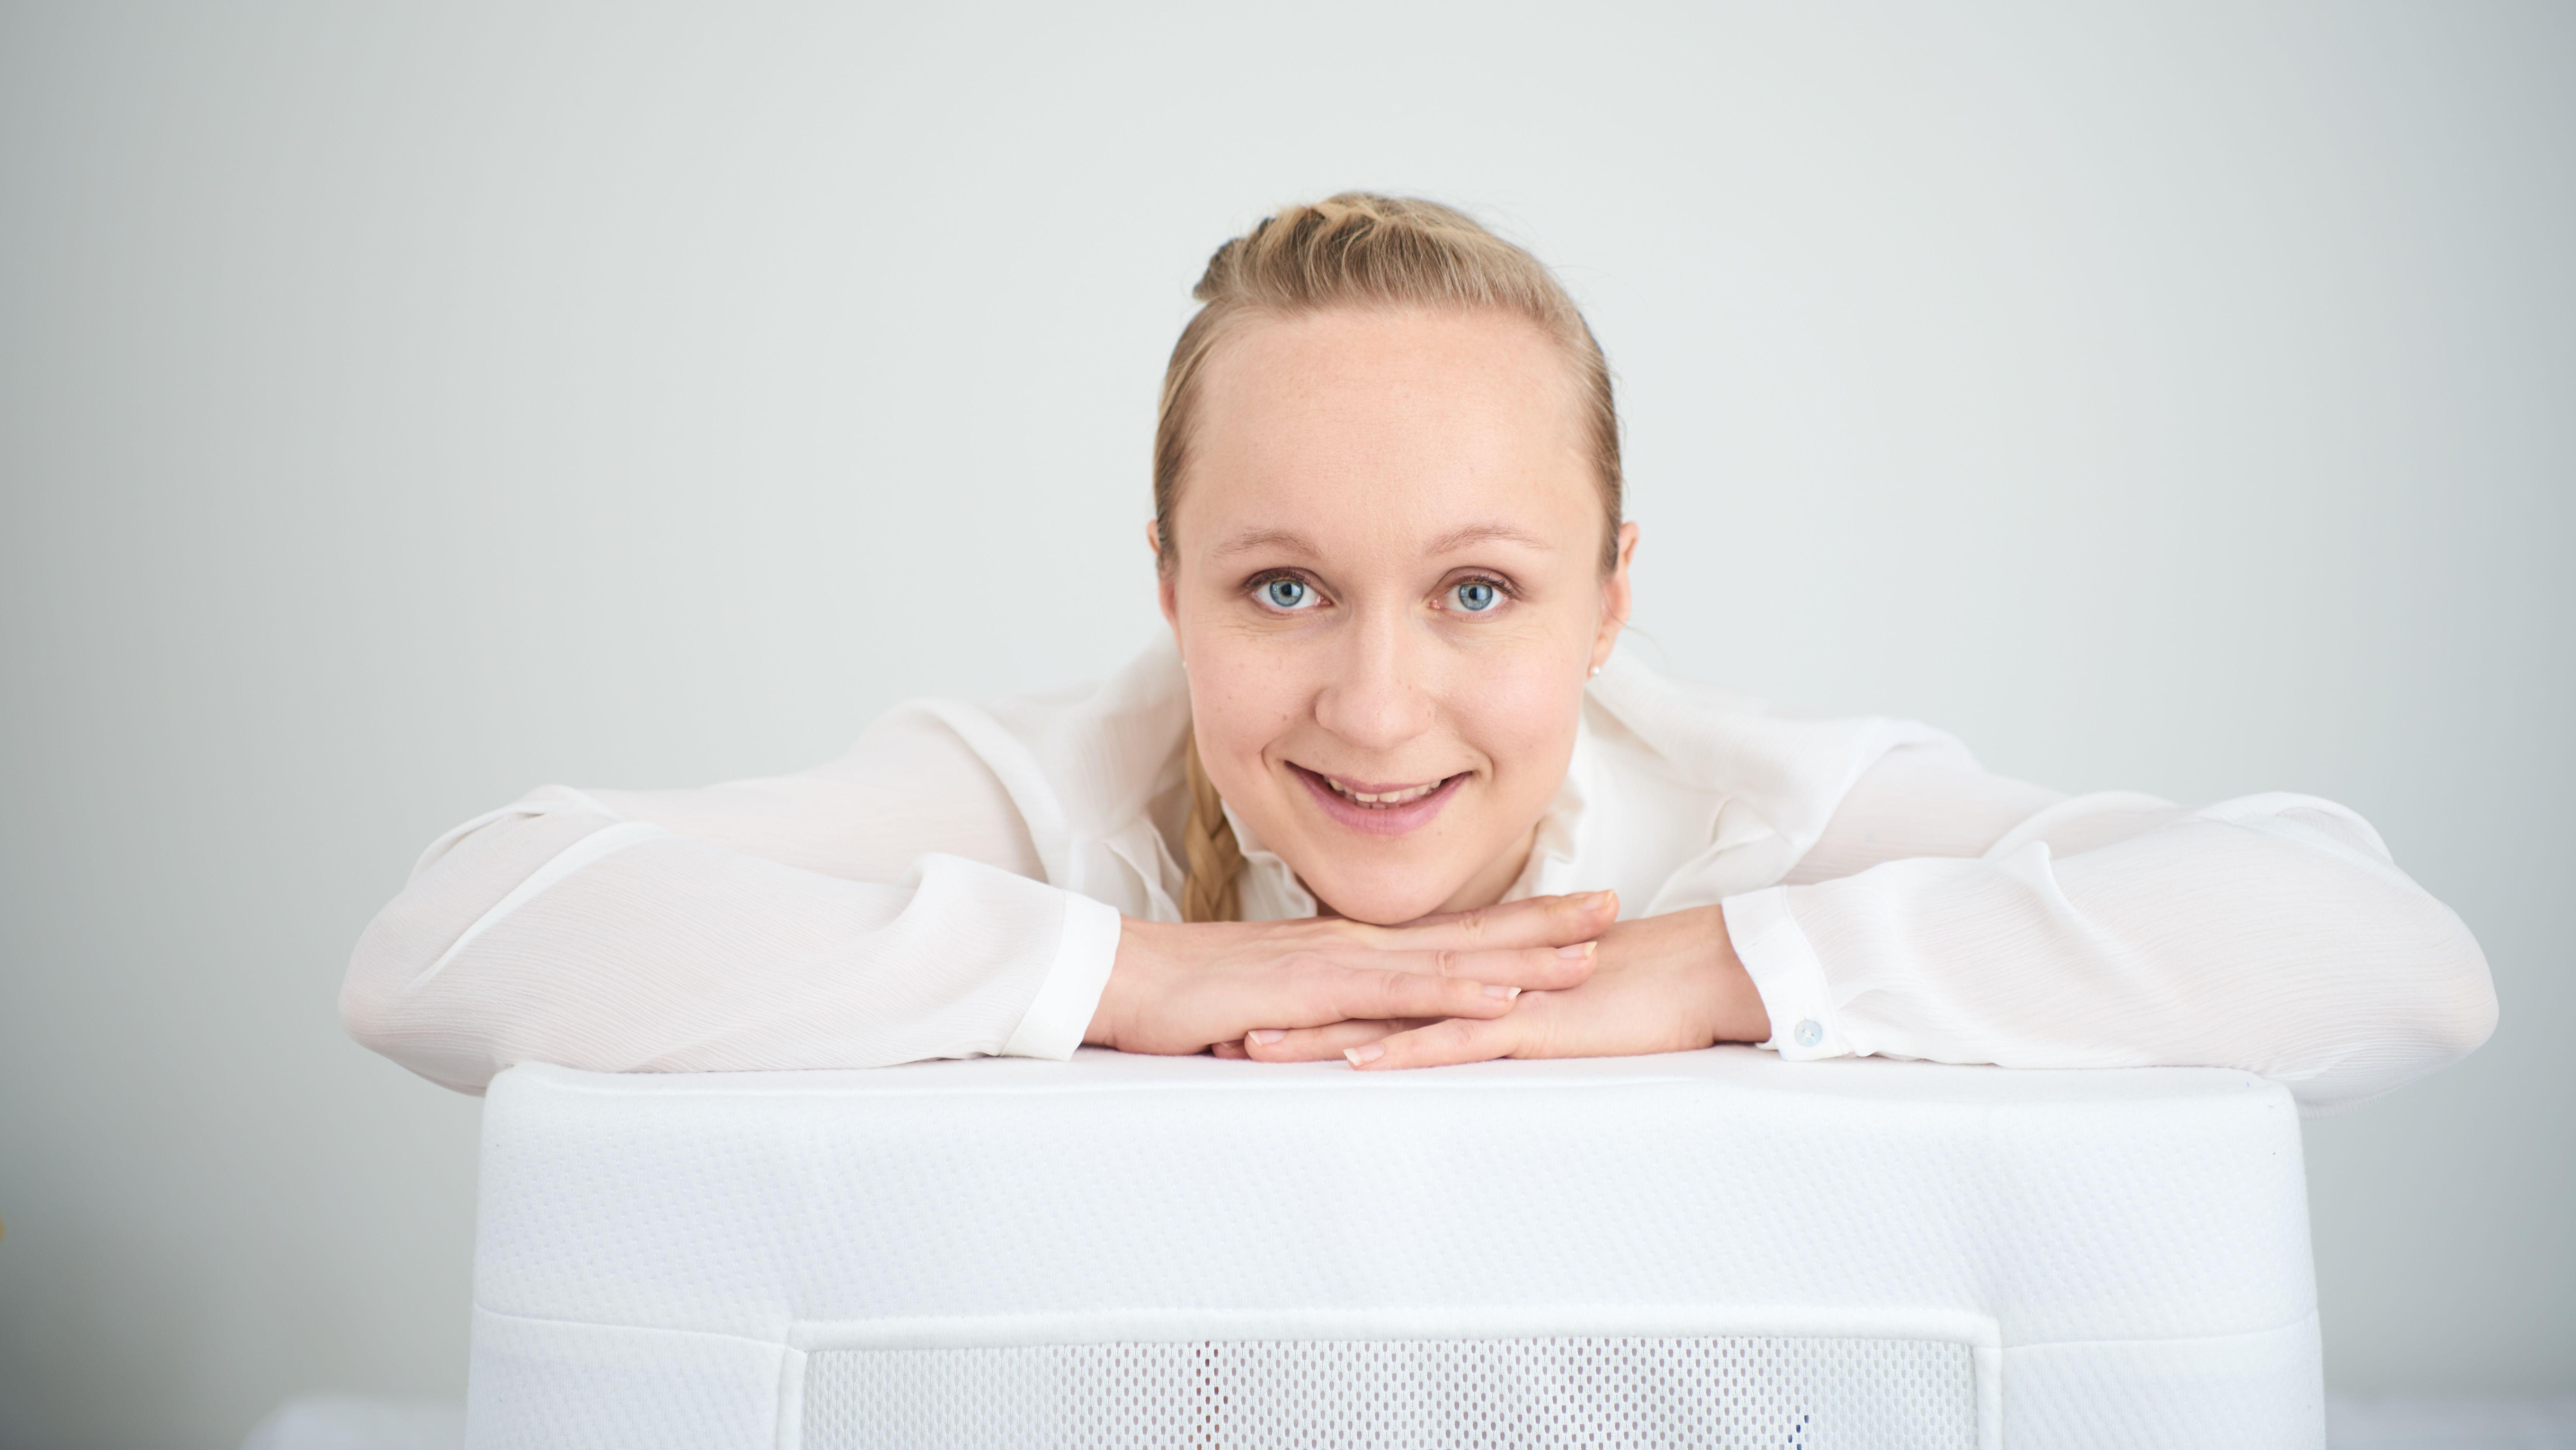 LullaMe-Gründerin Hanna Sissala aus Finnland